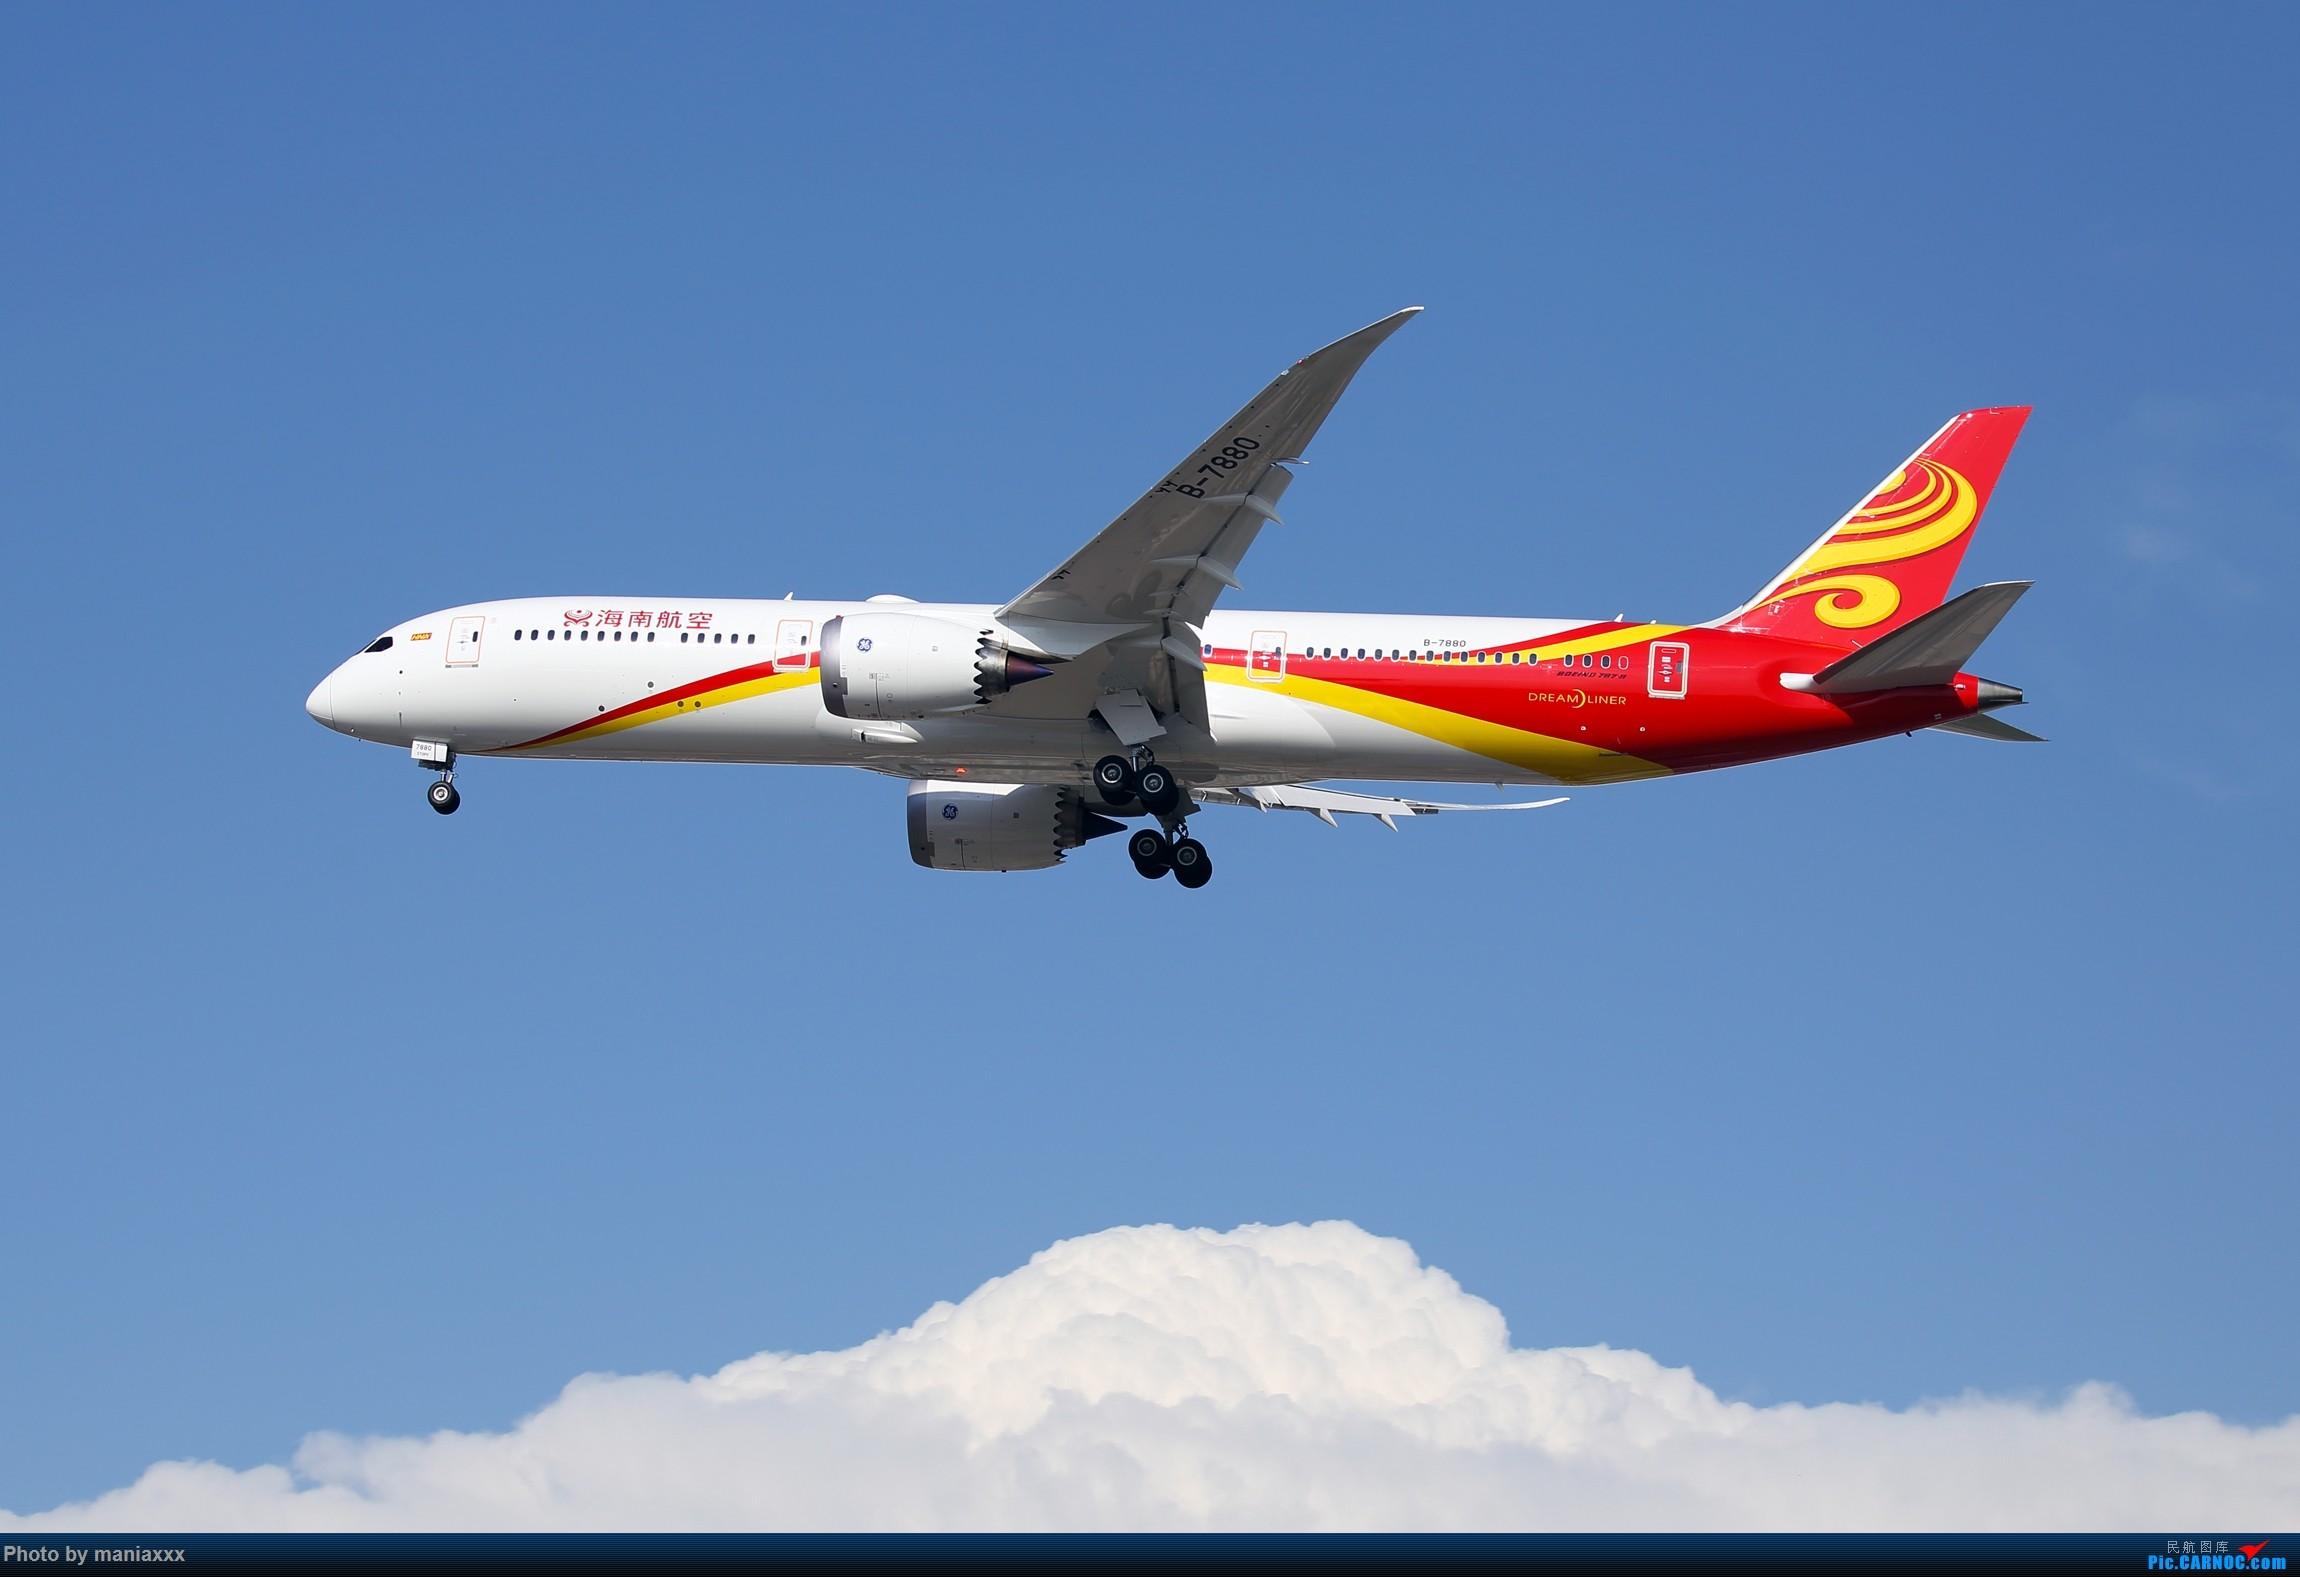 Re:[原创]国航第二架789~~B-7878~~欢迎回家~~~~P.S.附上今天的另外两架789~~~~~ BOEING 787-9 B-7880 中国北京首都国际机场